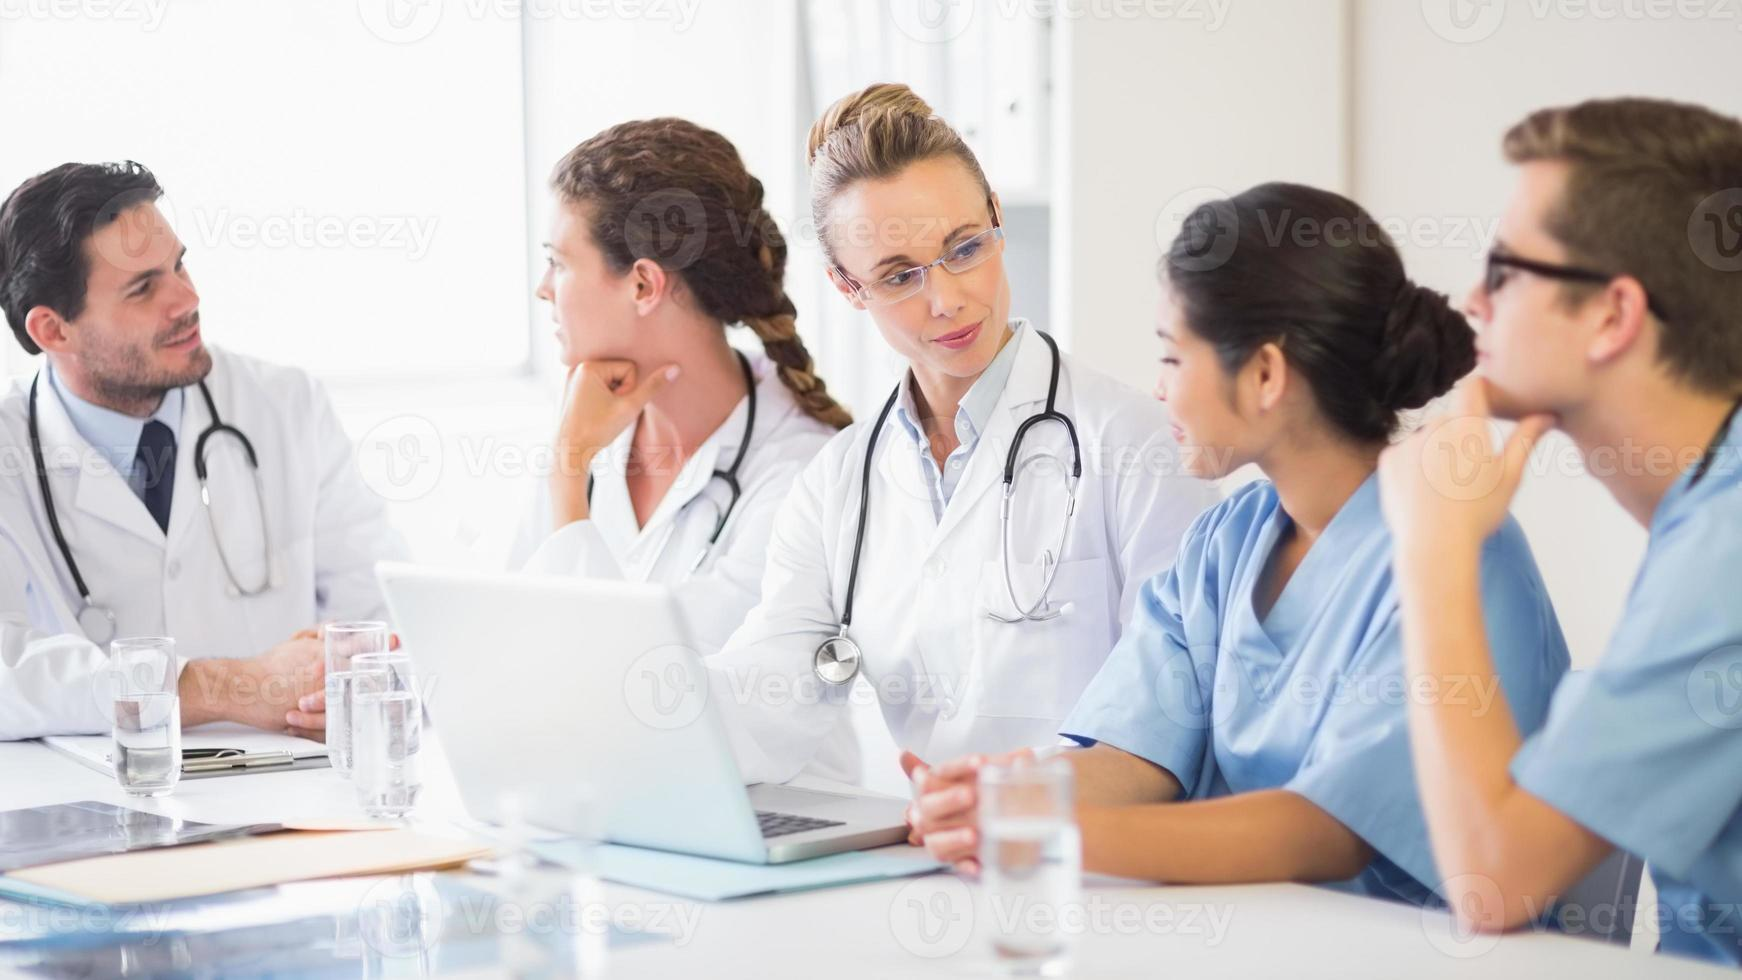 Medical team discussing photo